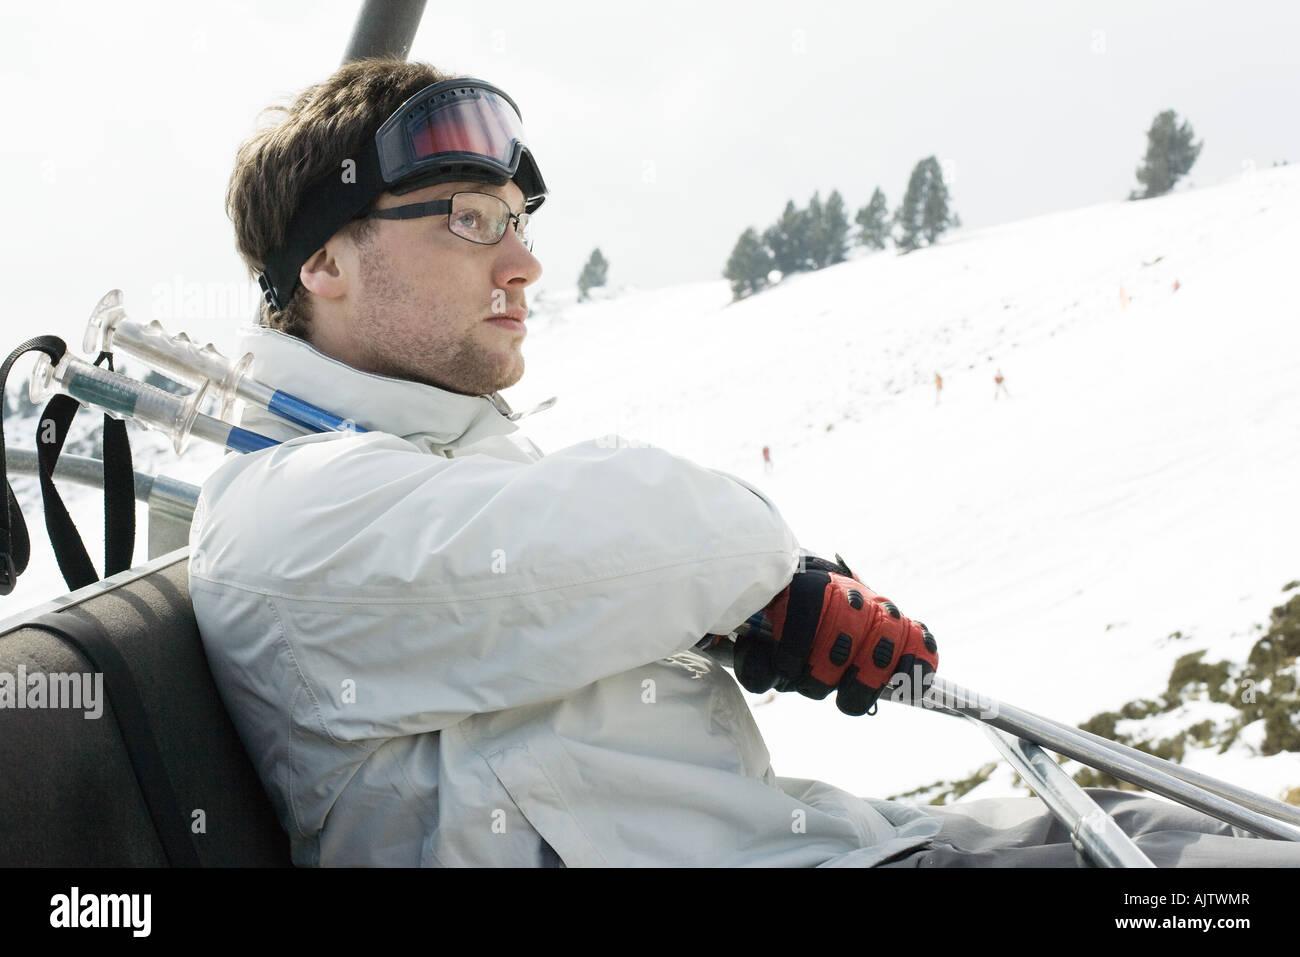 Young man taking ski lift Stock Photo